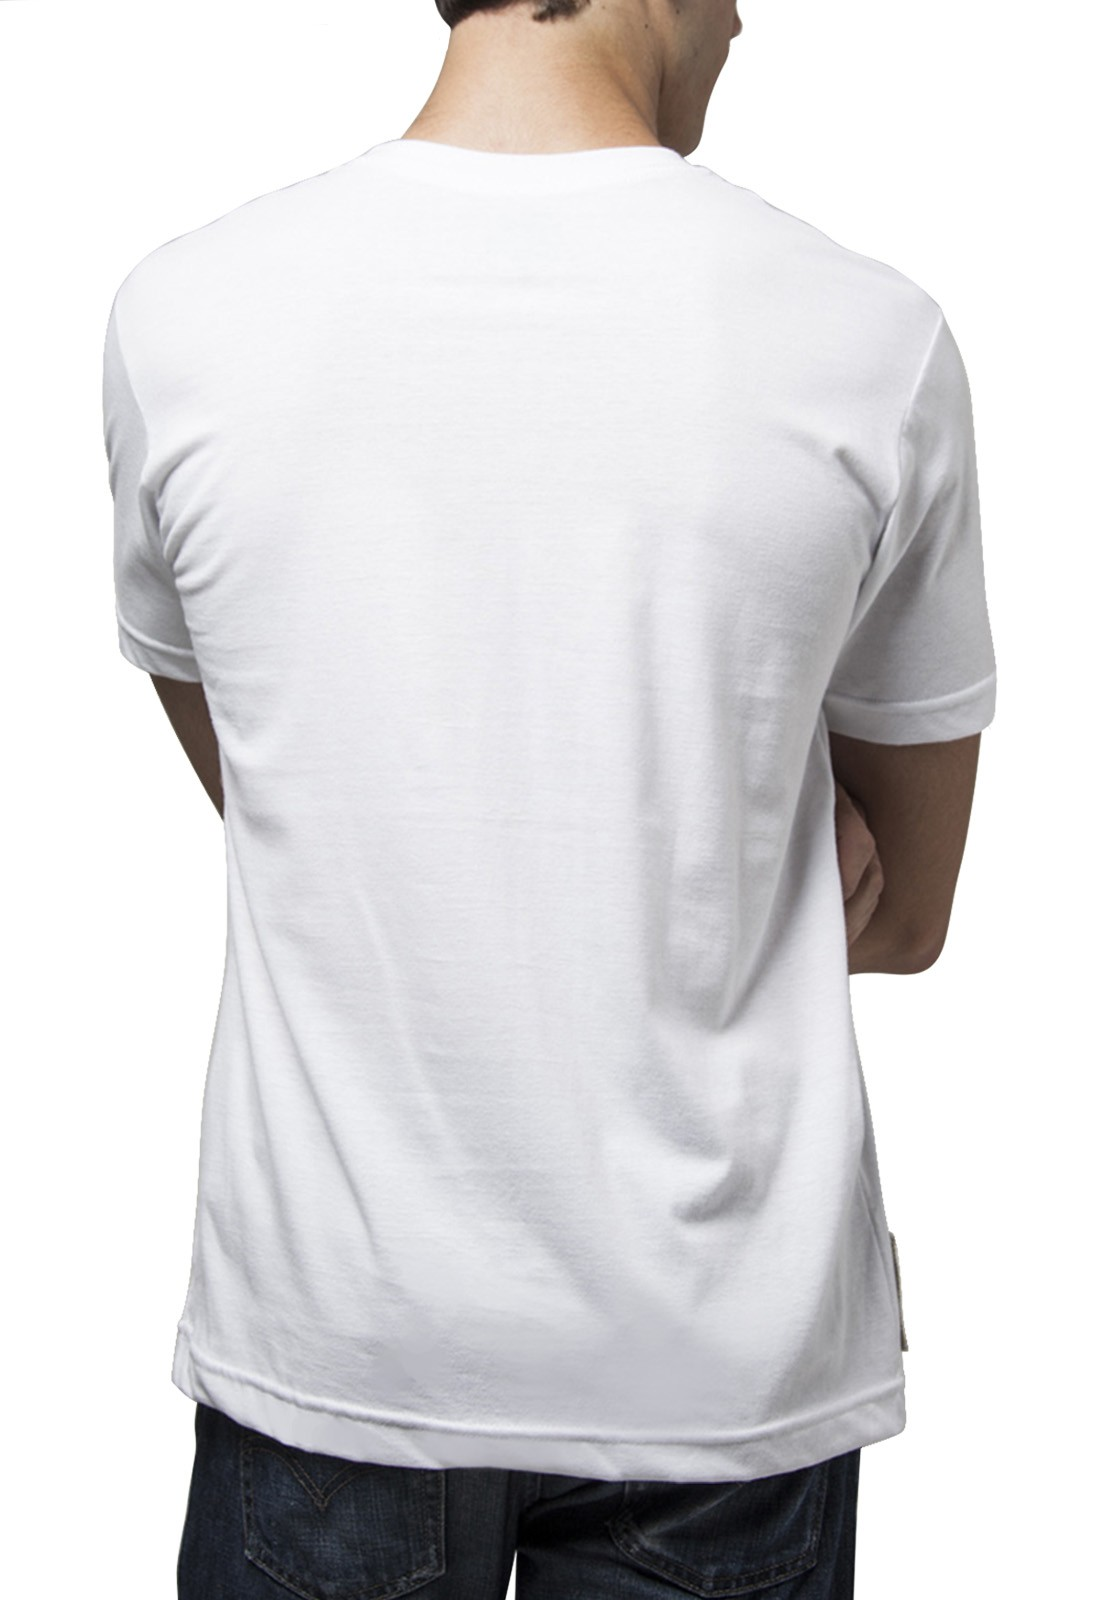 Camiseta Amazônia Arte Flechas - Branco